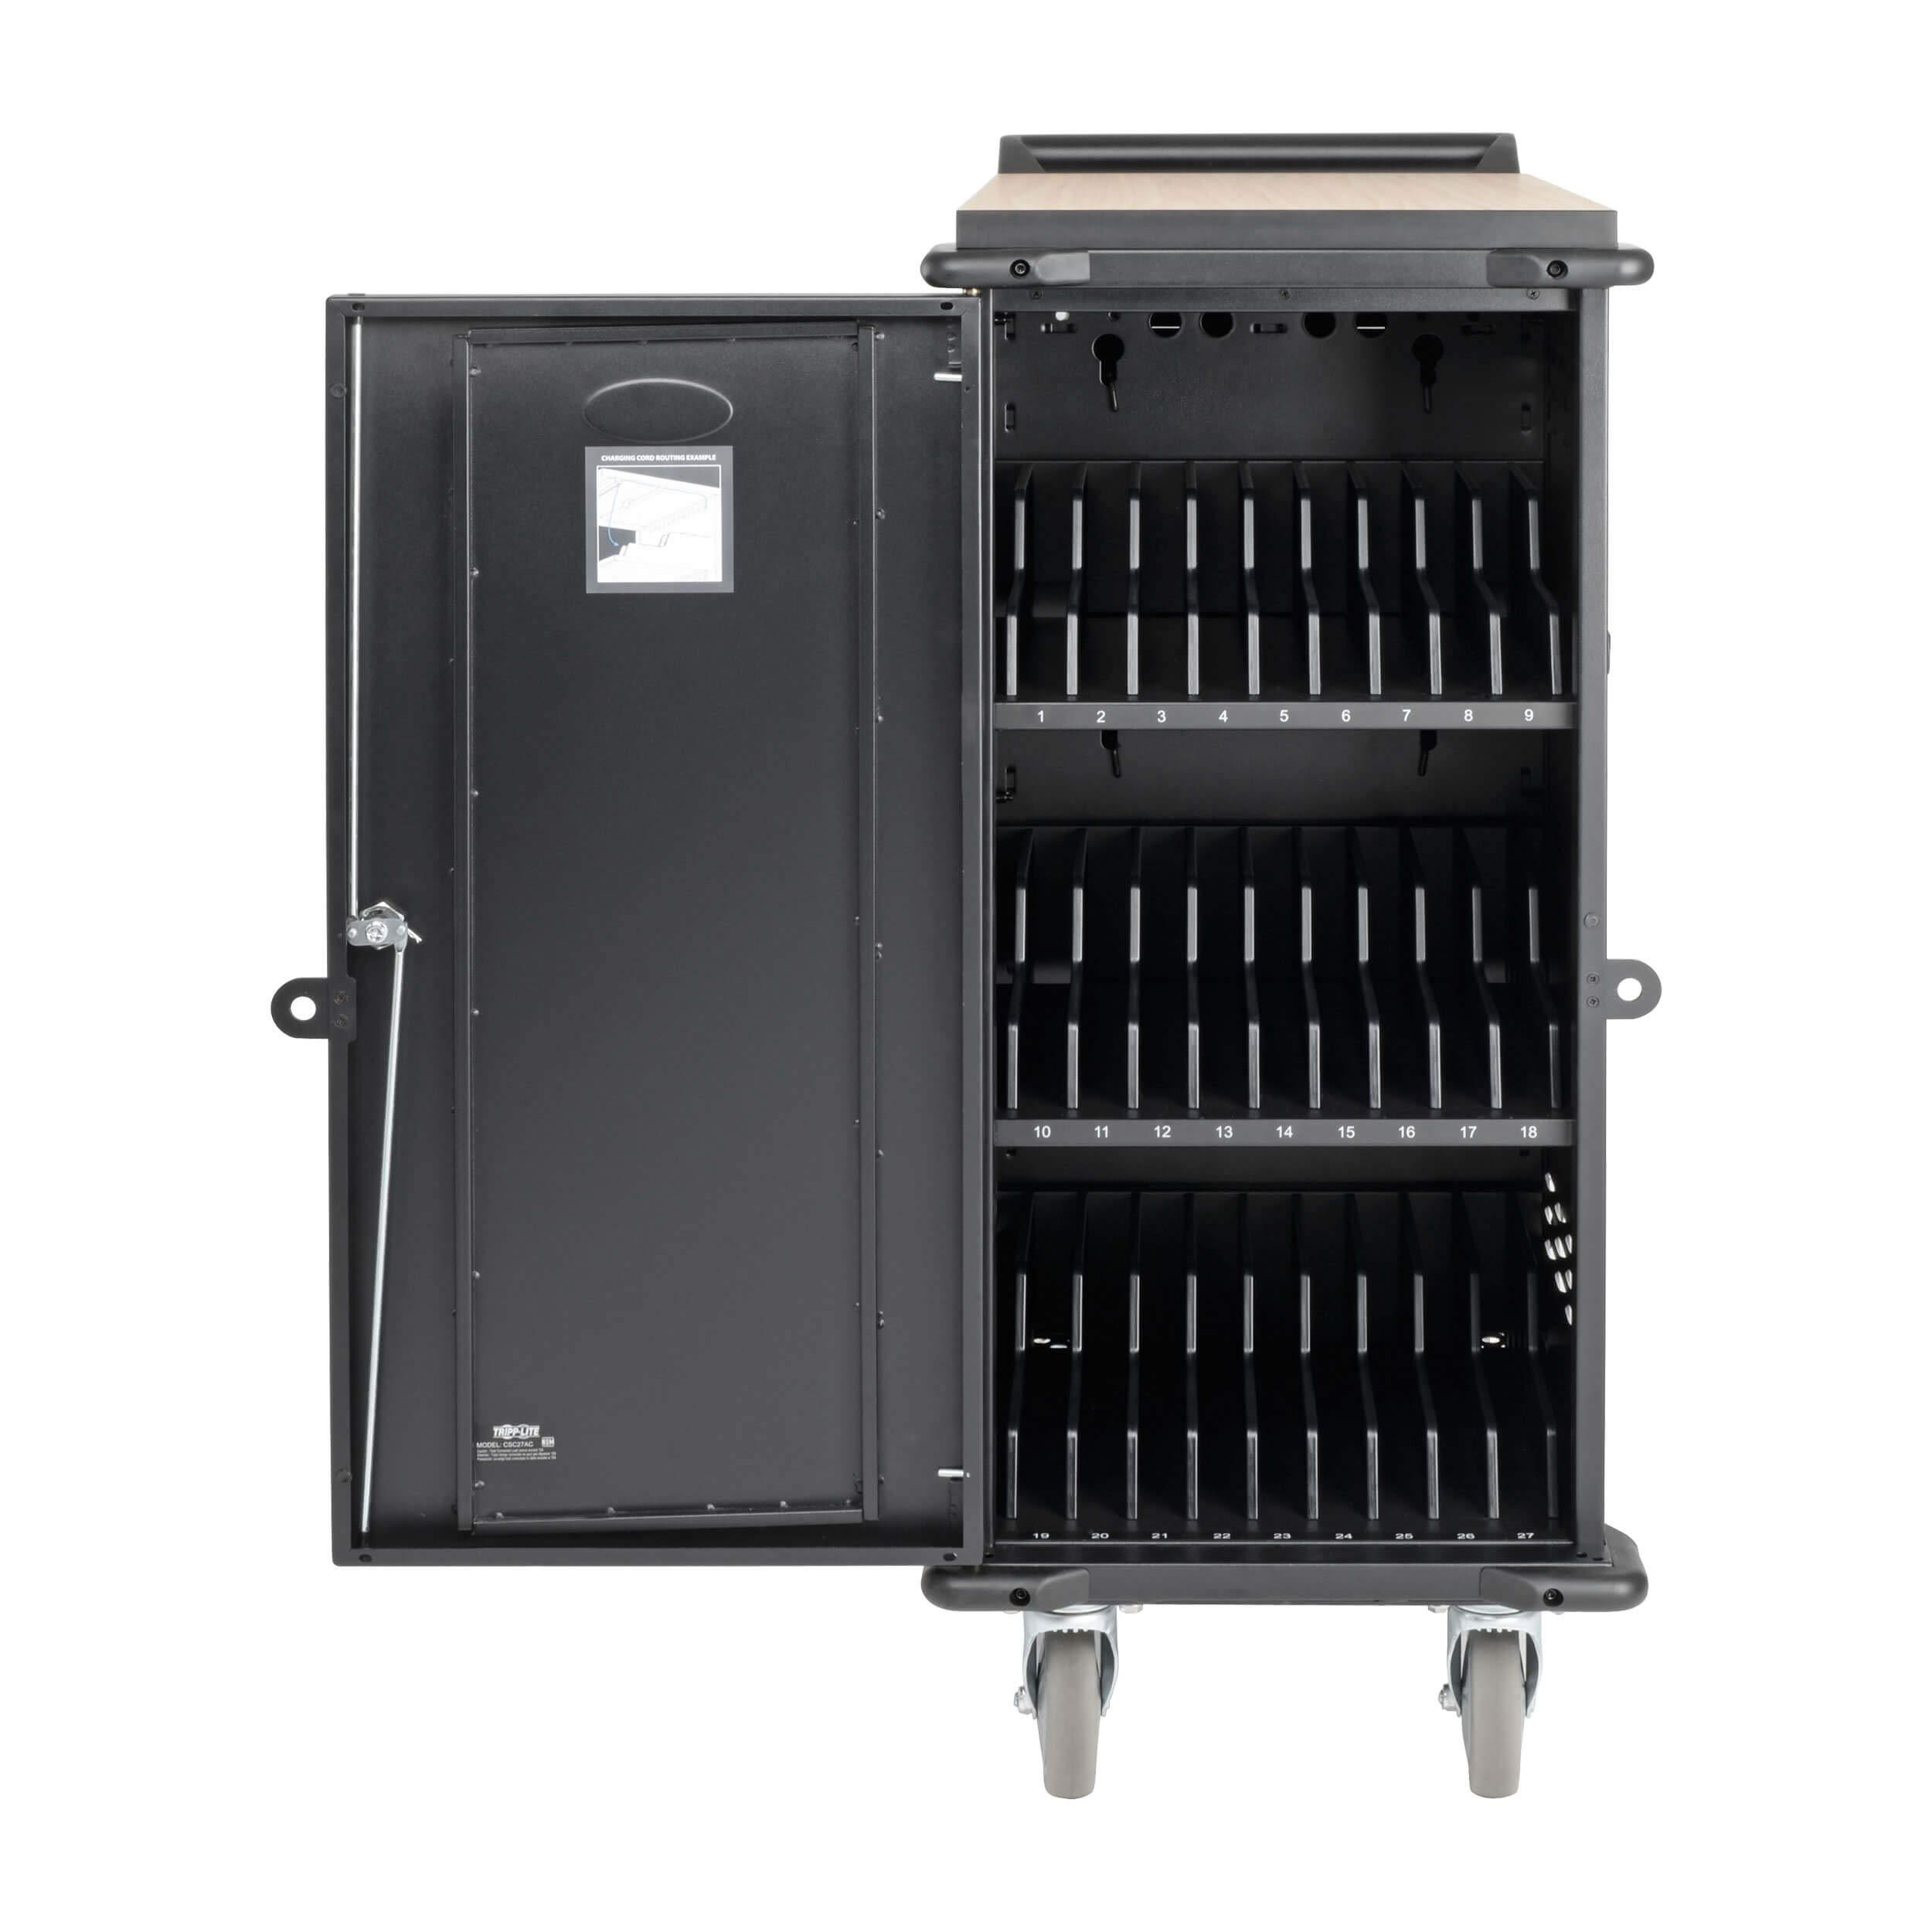 Tripp Lite 27-Port AC Mobile Charging Cart Storage Station for Chromebooks, iPads, Laptops, Tablets, Black (CSC27AC) by Tripp Lite (Image #2)